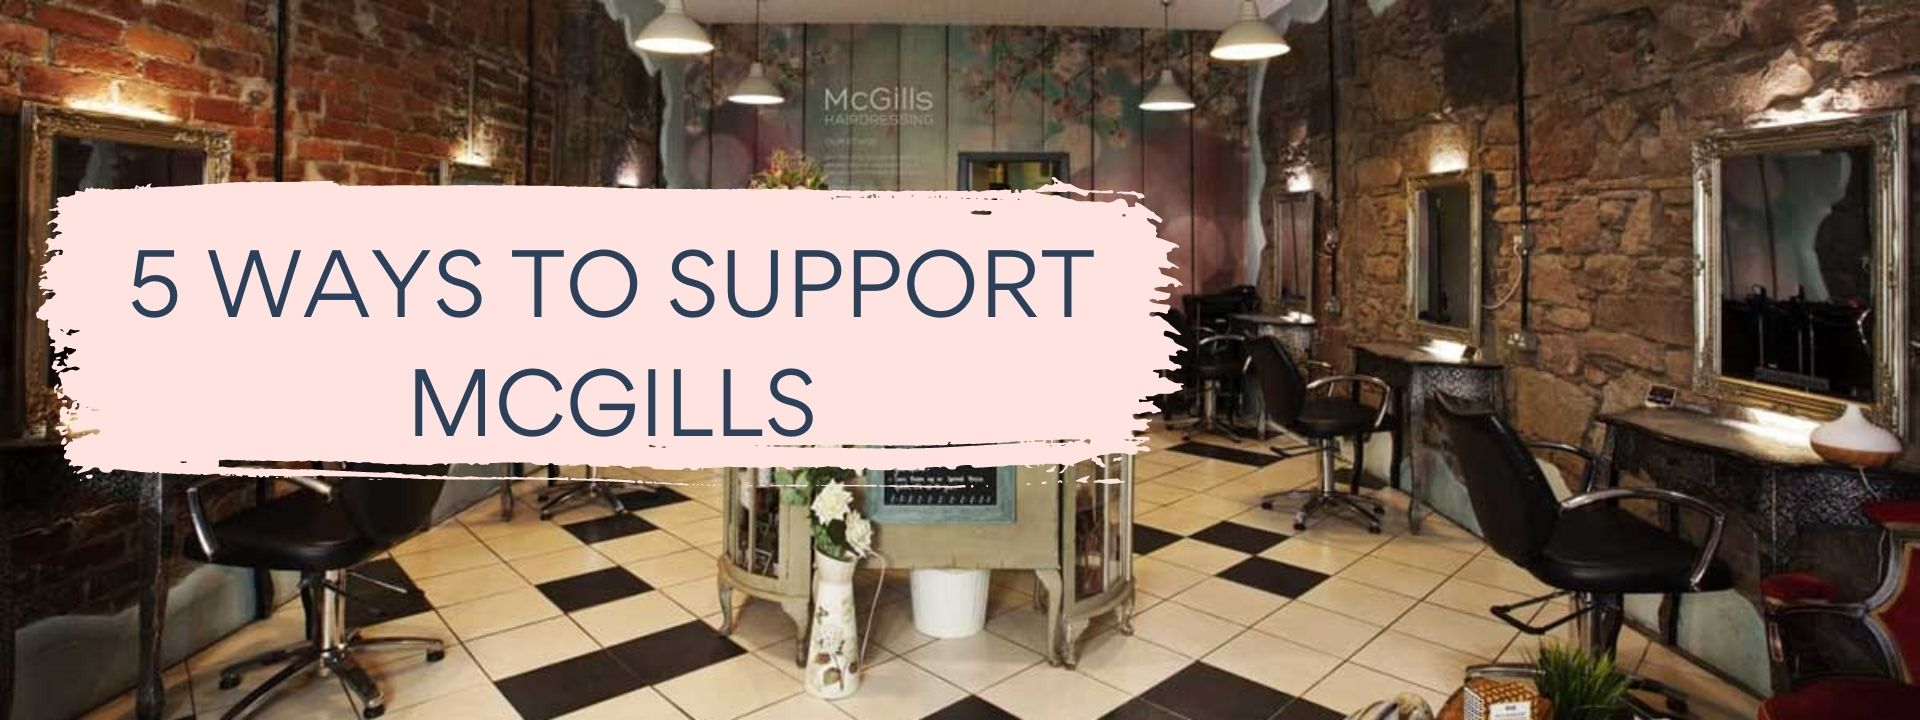 Support Small Businesses, McGills Hairdressing Salon in Edinburgh